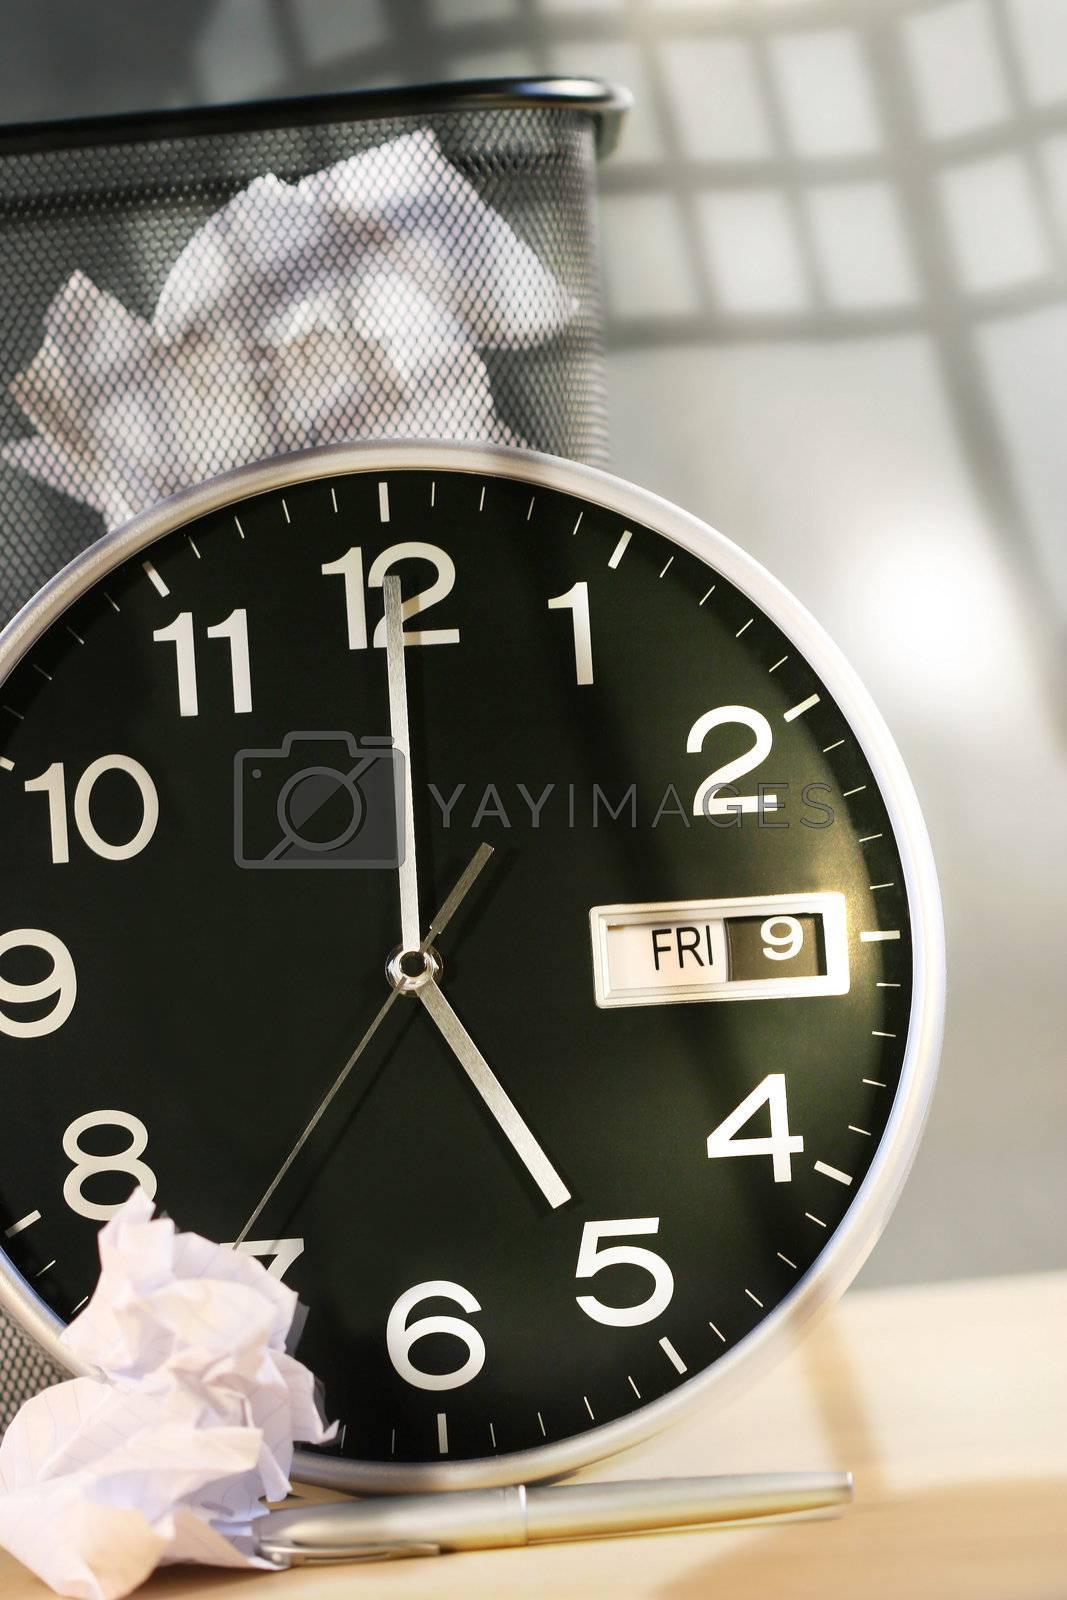 Clock, wast paper basket on desk/ end of work day